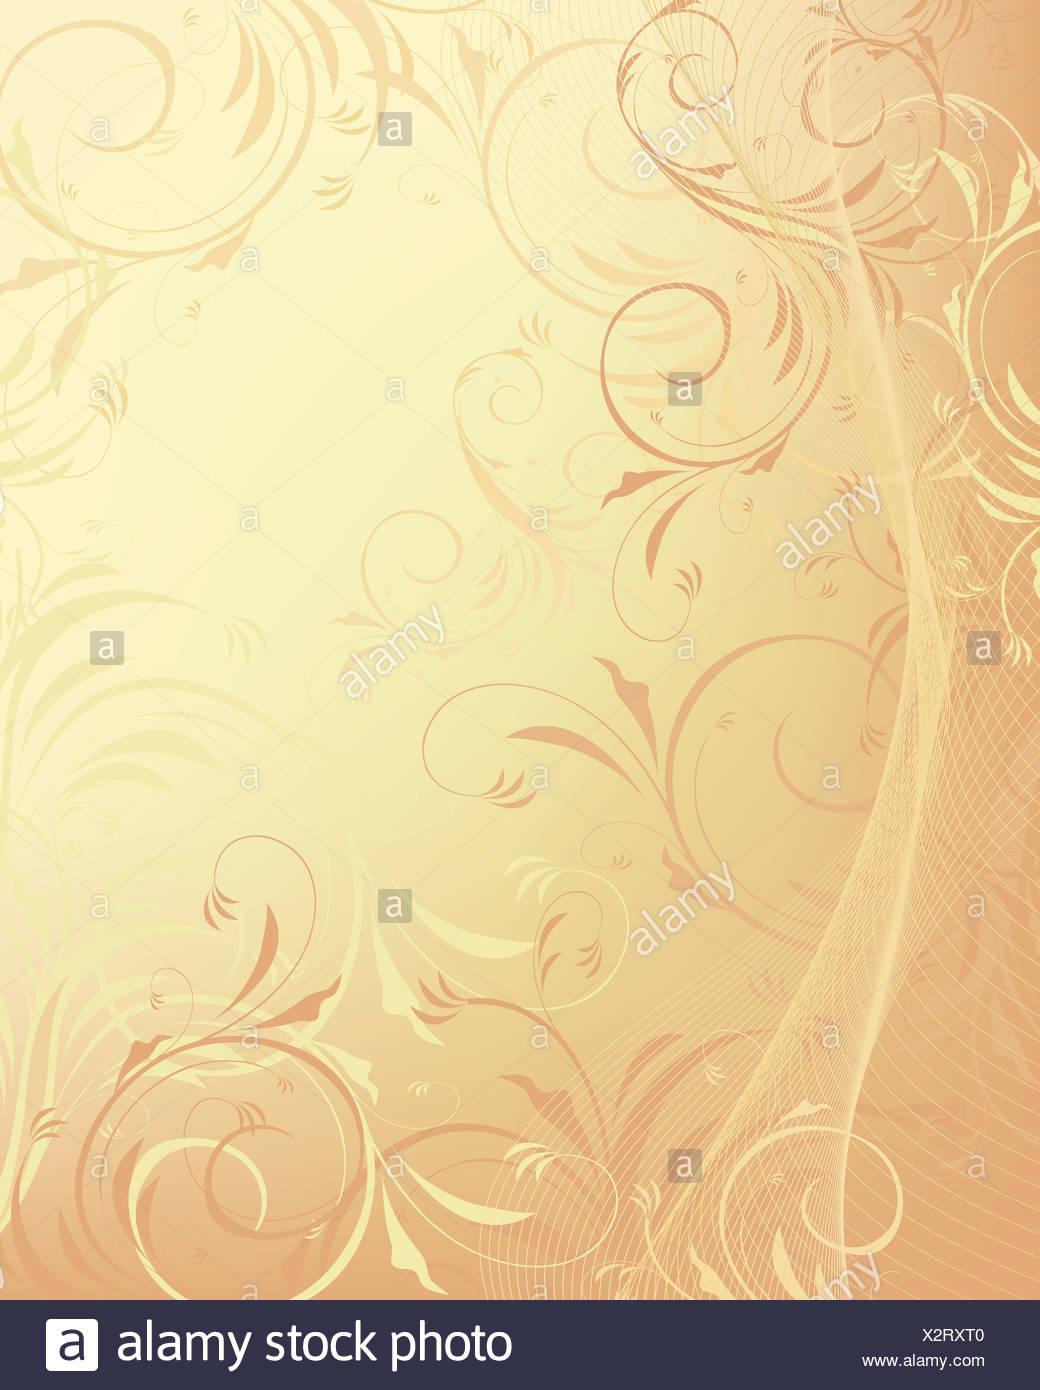 Pastel floral background - Stock Image